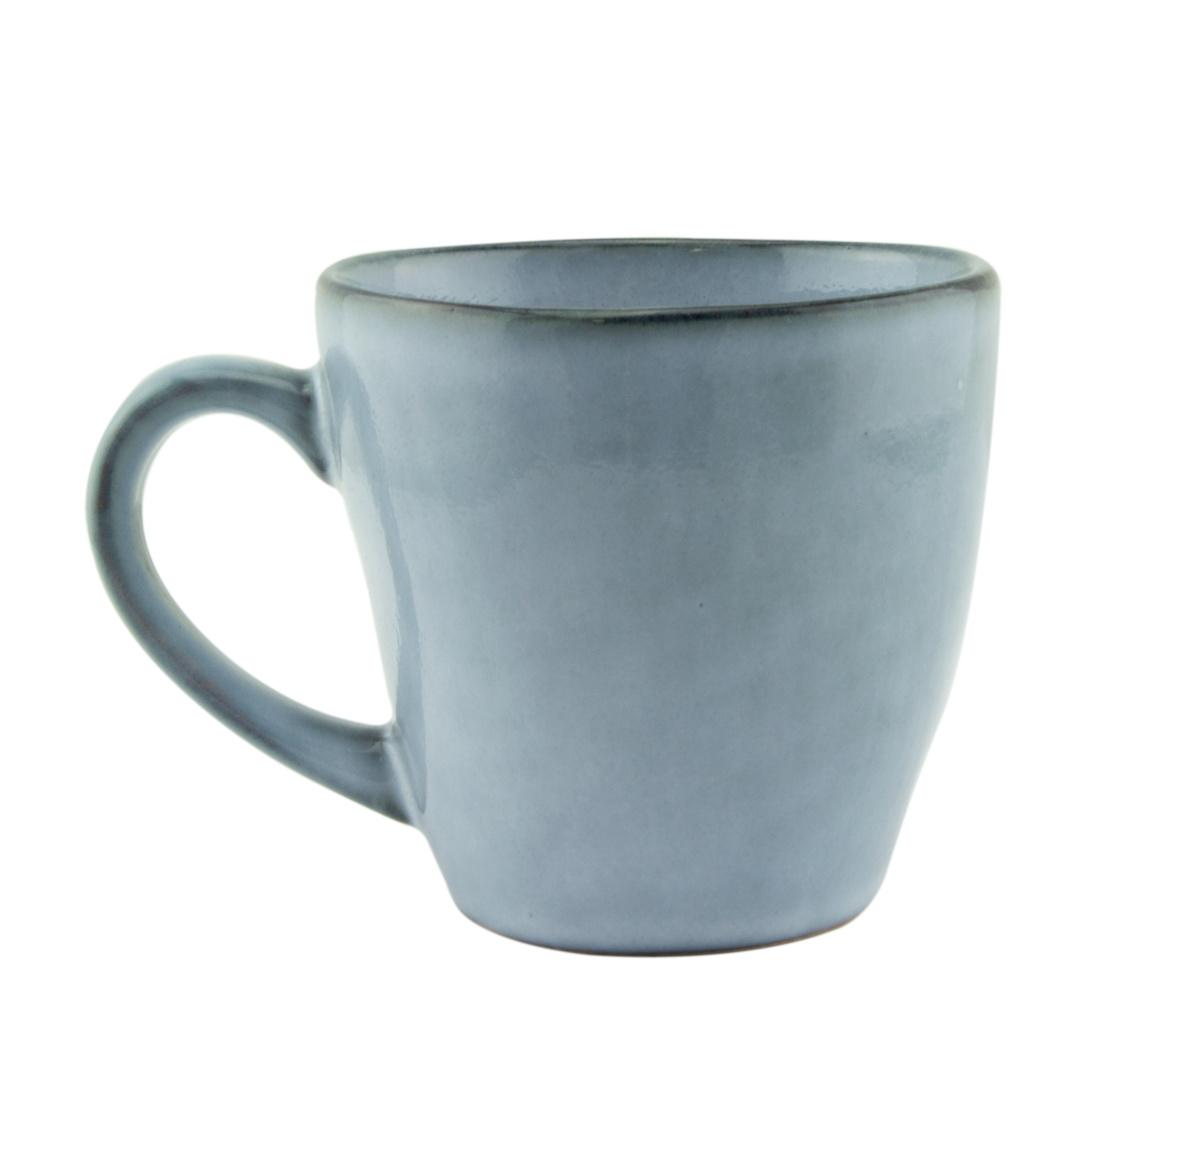 Tasse à expresso bleue grès 9 cl Ø 6,20 cm Sky Pro.mundi